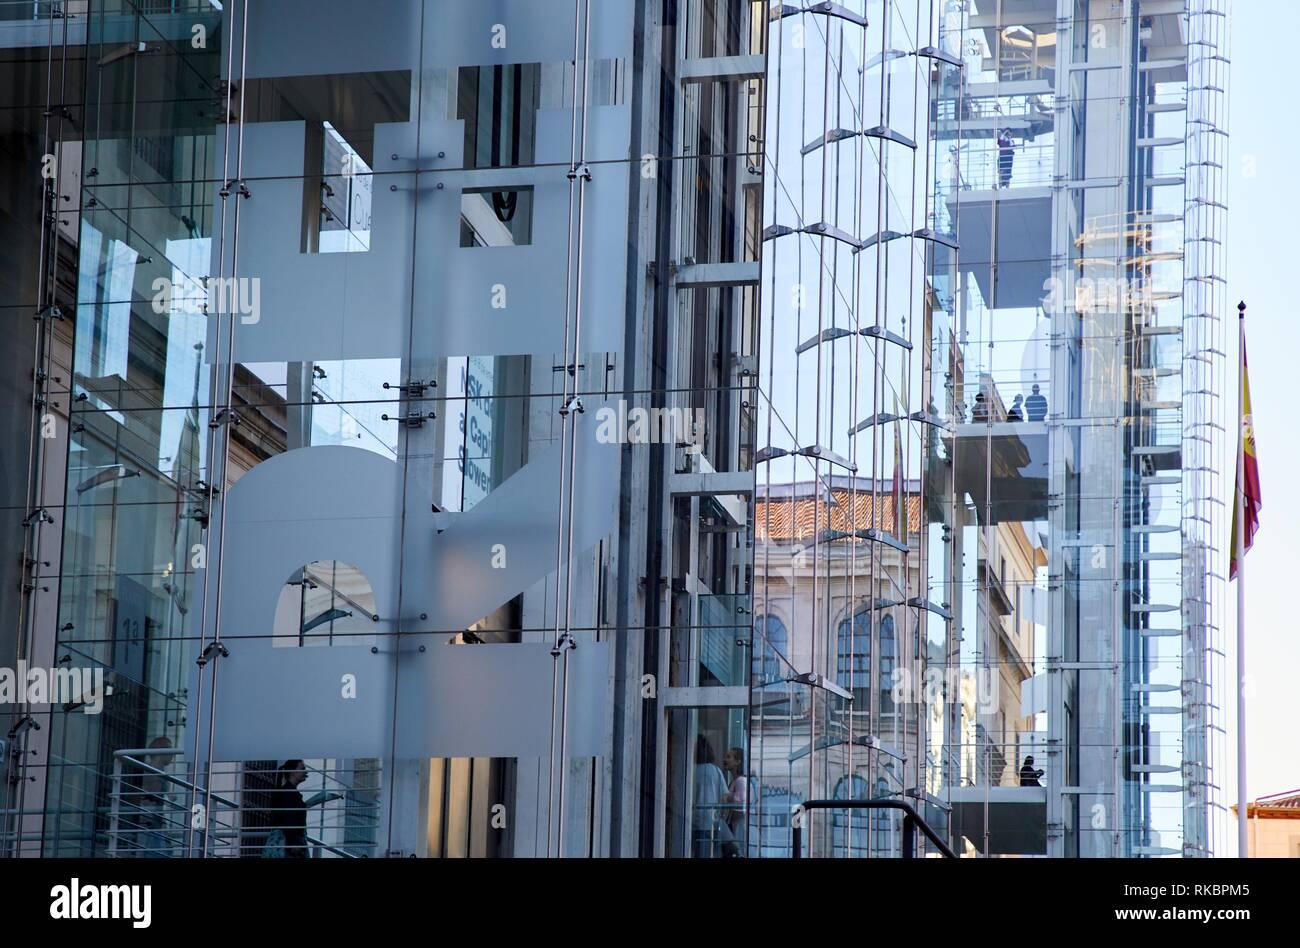 Museo Nacional Centro de Arte Reina Sofia, Madrid, Spagna, Europa Immagini Stock